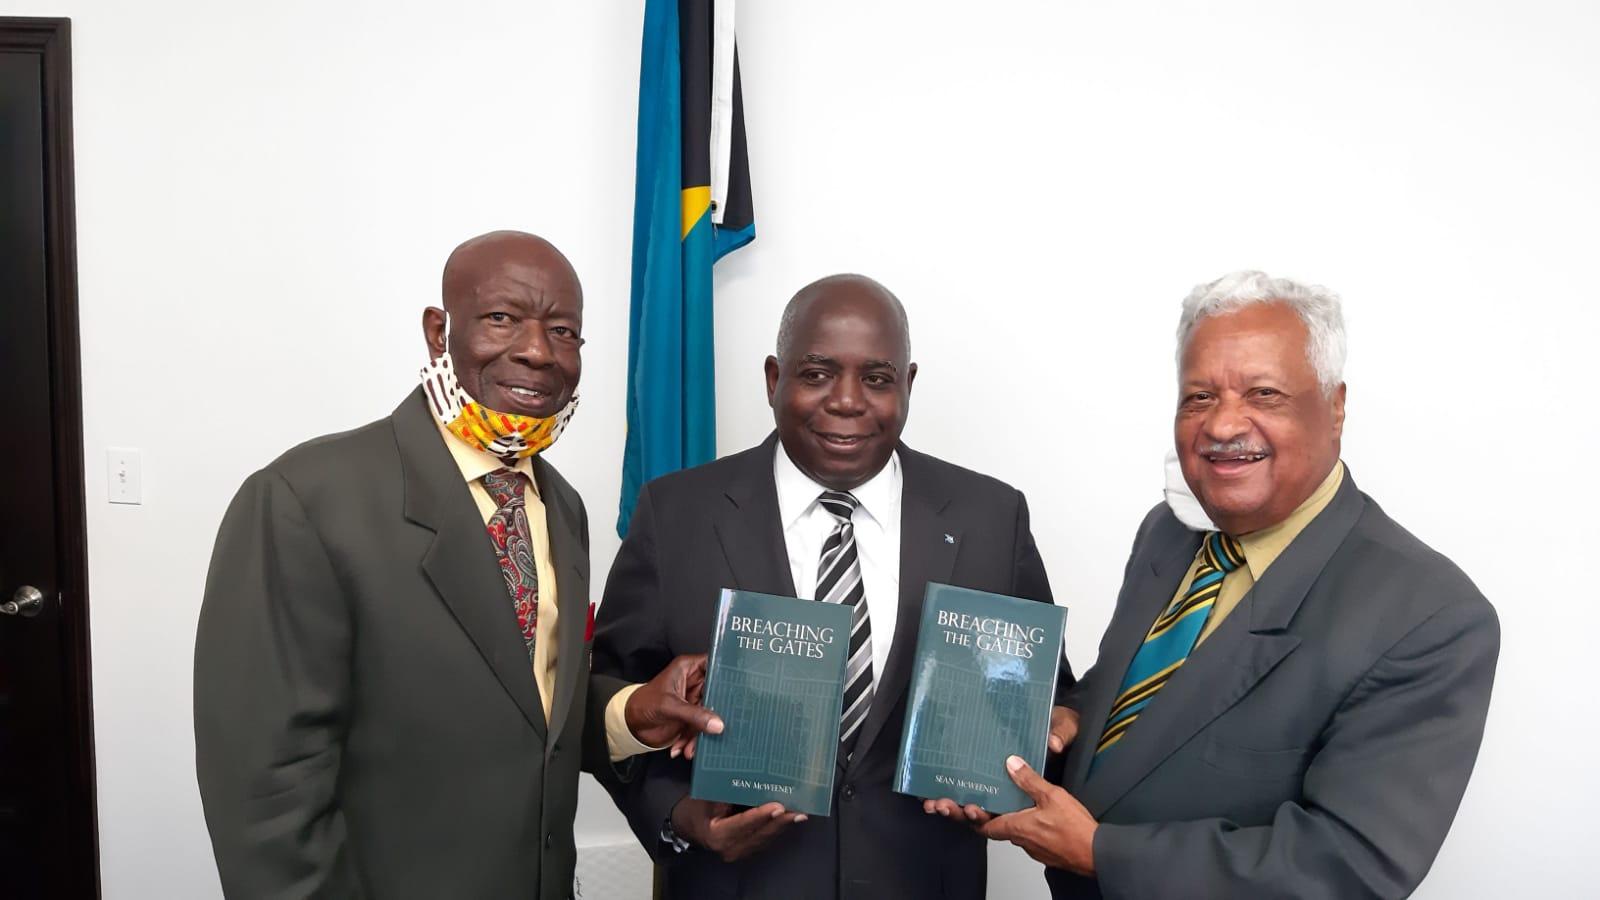 Evangelist Rex Major presents book to Opposition leader